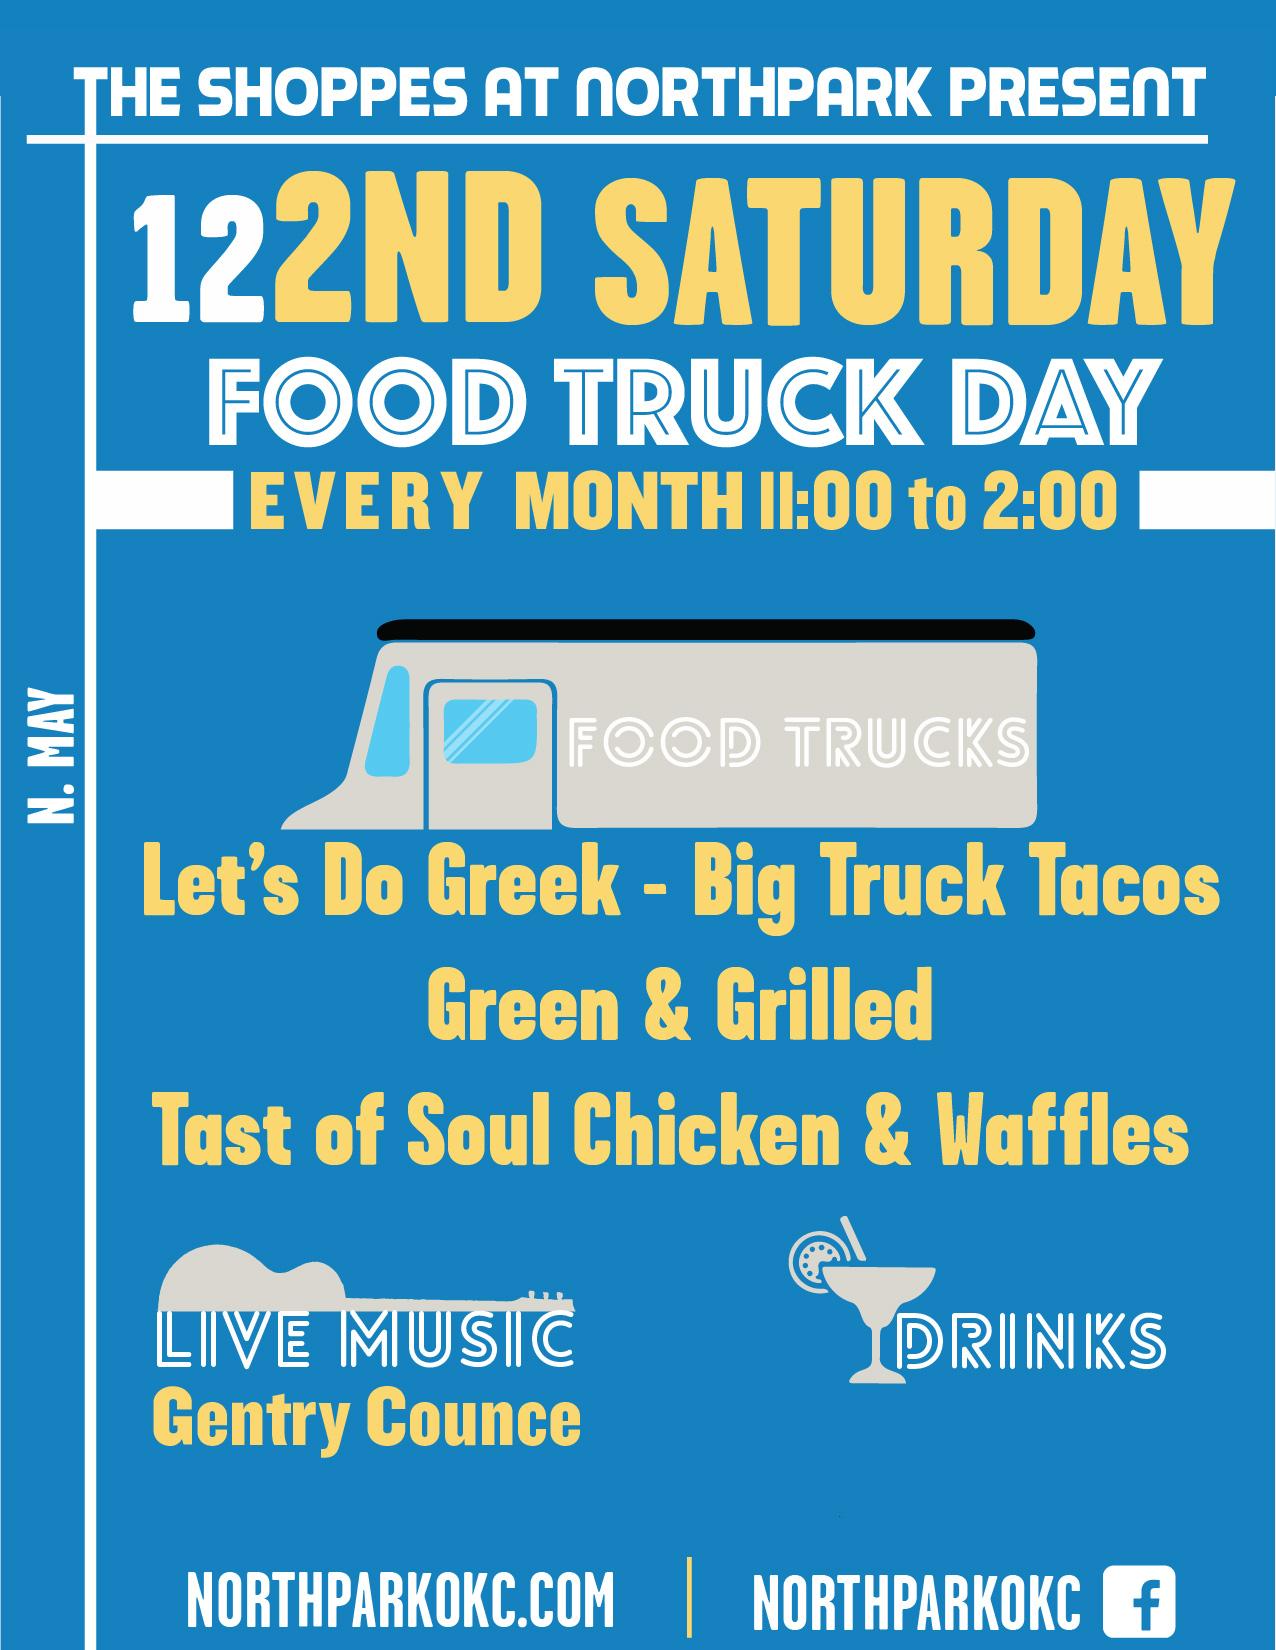 food-truck-day-flyer-02.jpg